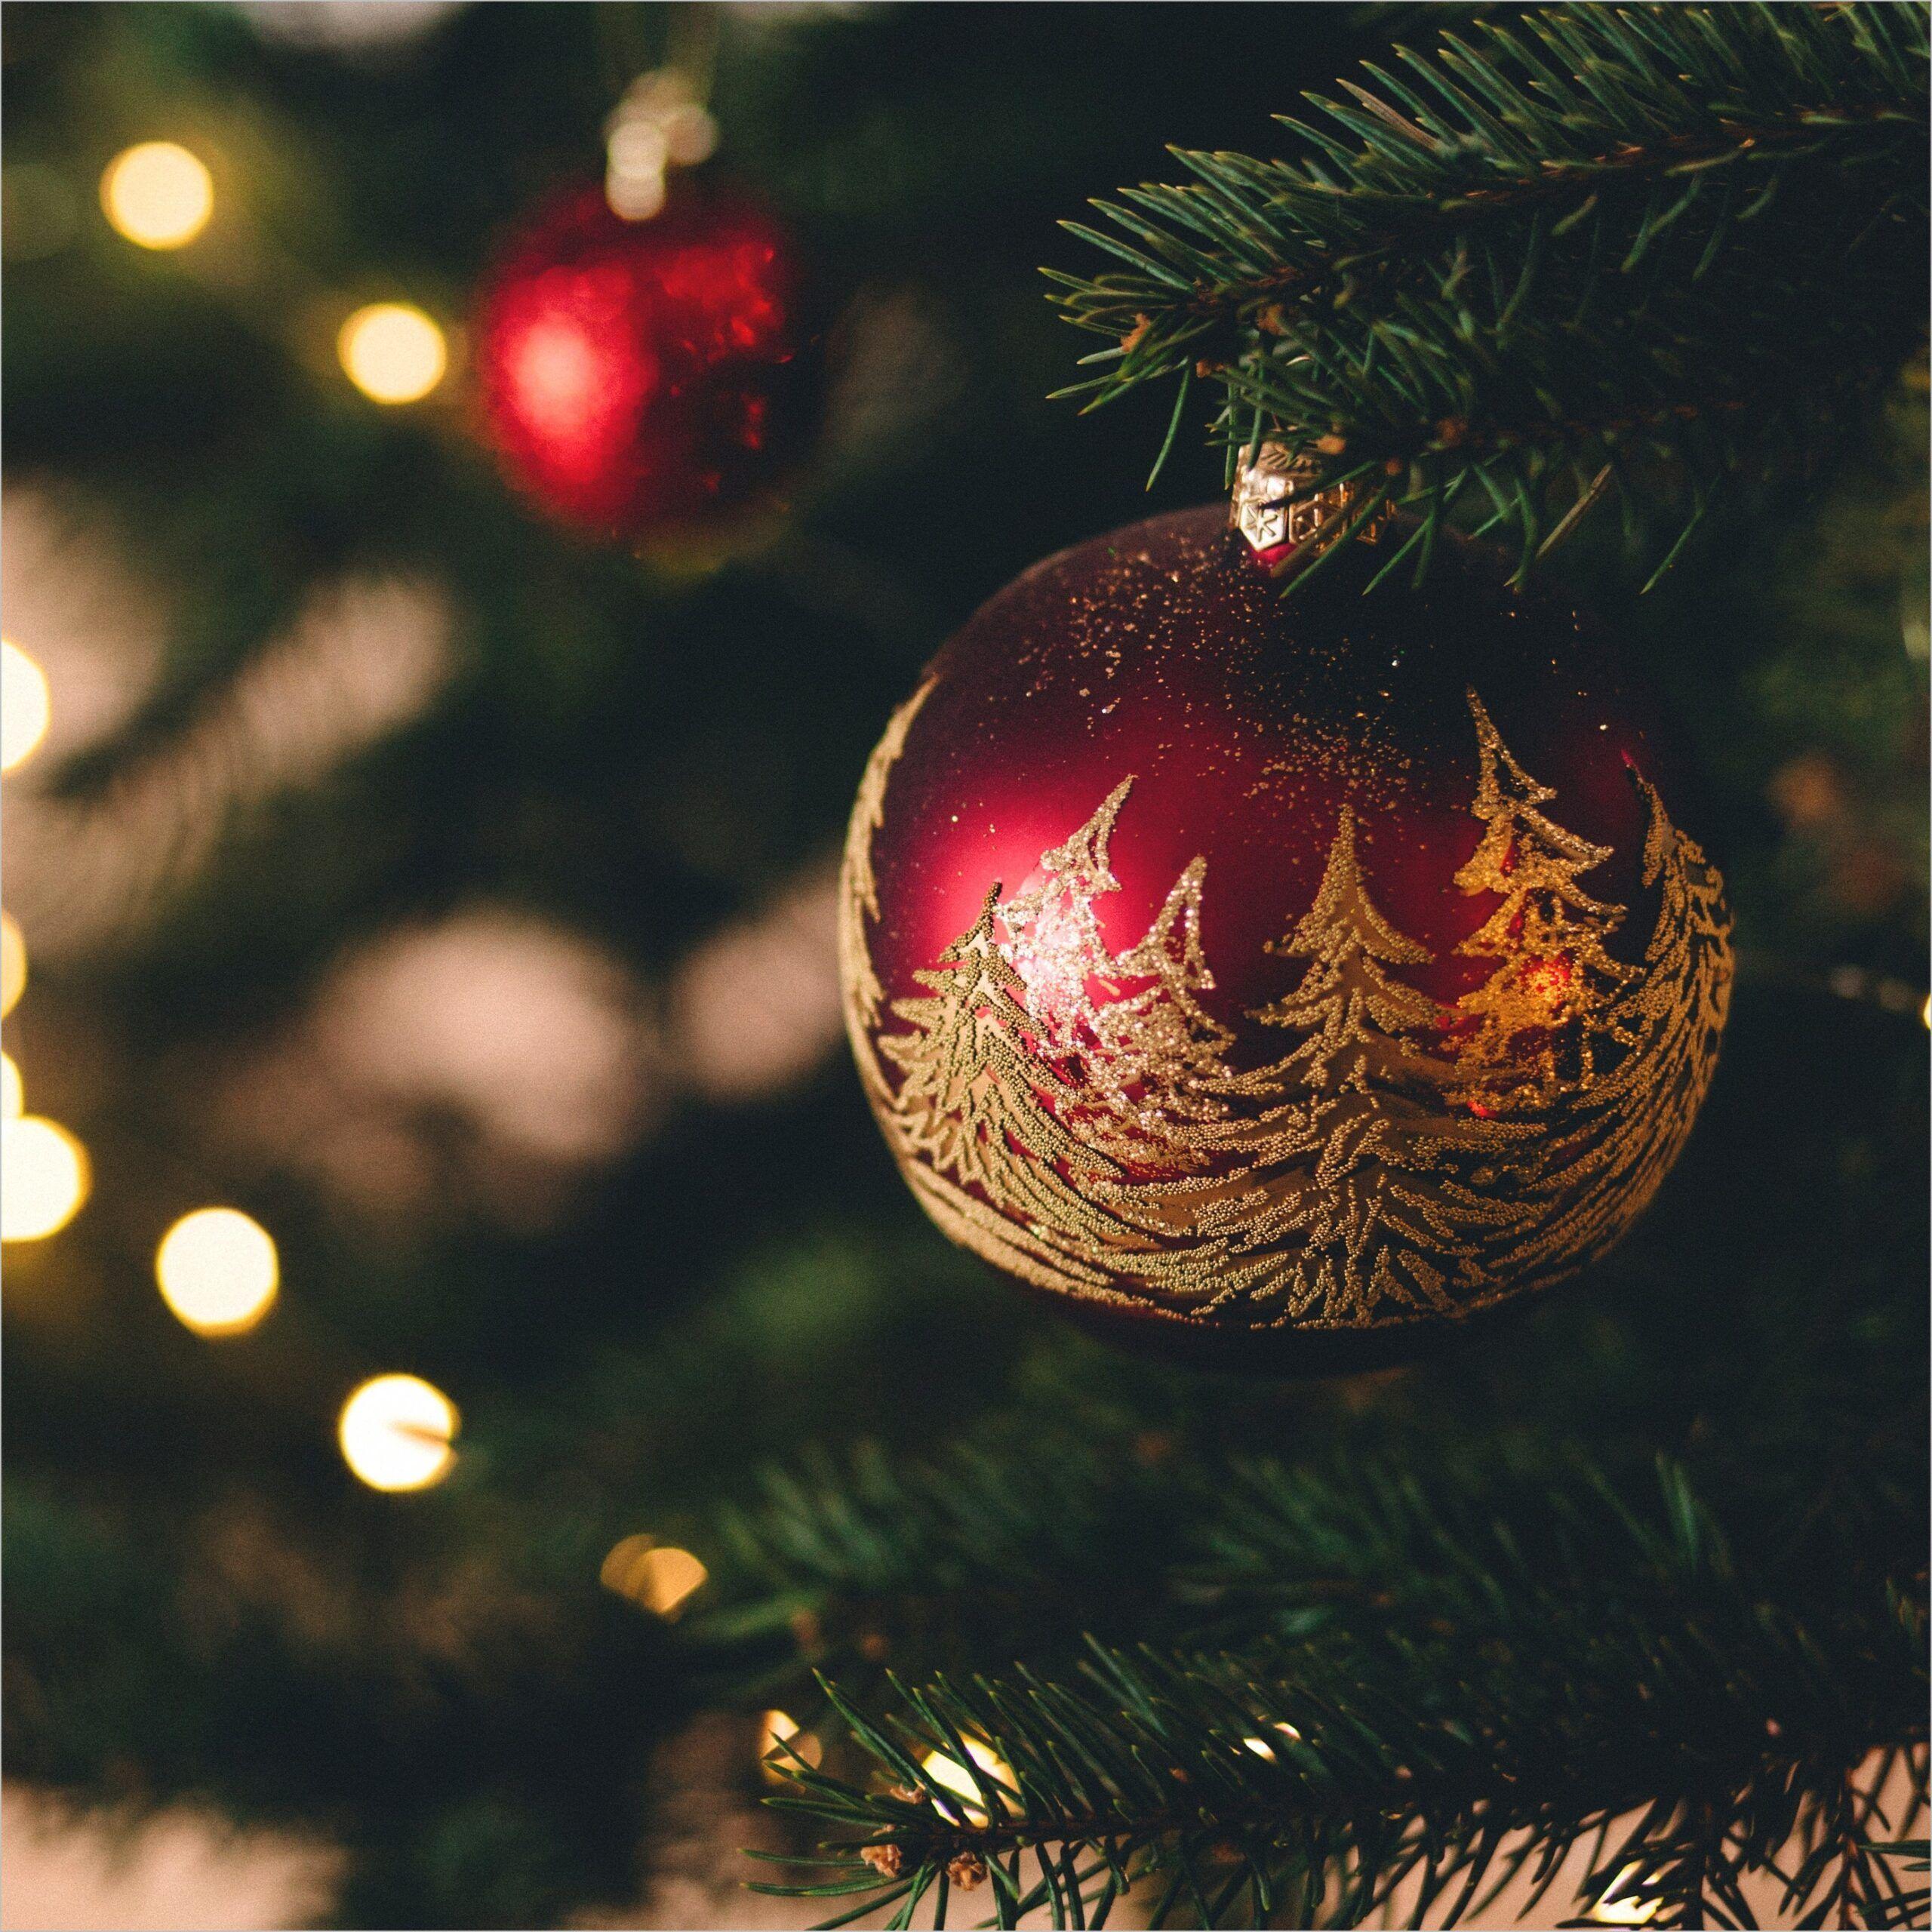 Ipad Pro Wallpaper 4k Christmas Christmas Ipad Pro Wallpaper In 2020 Christmas Home Holiday Christmas Bulbs